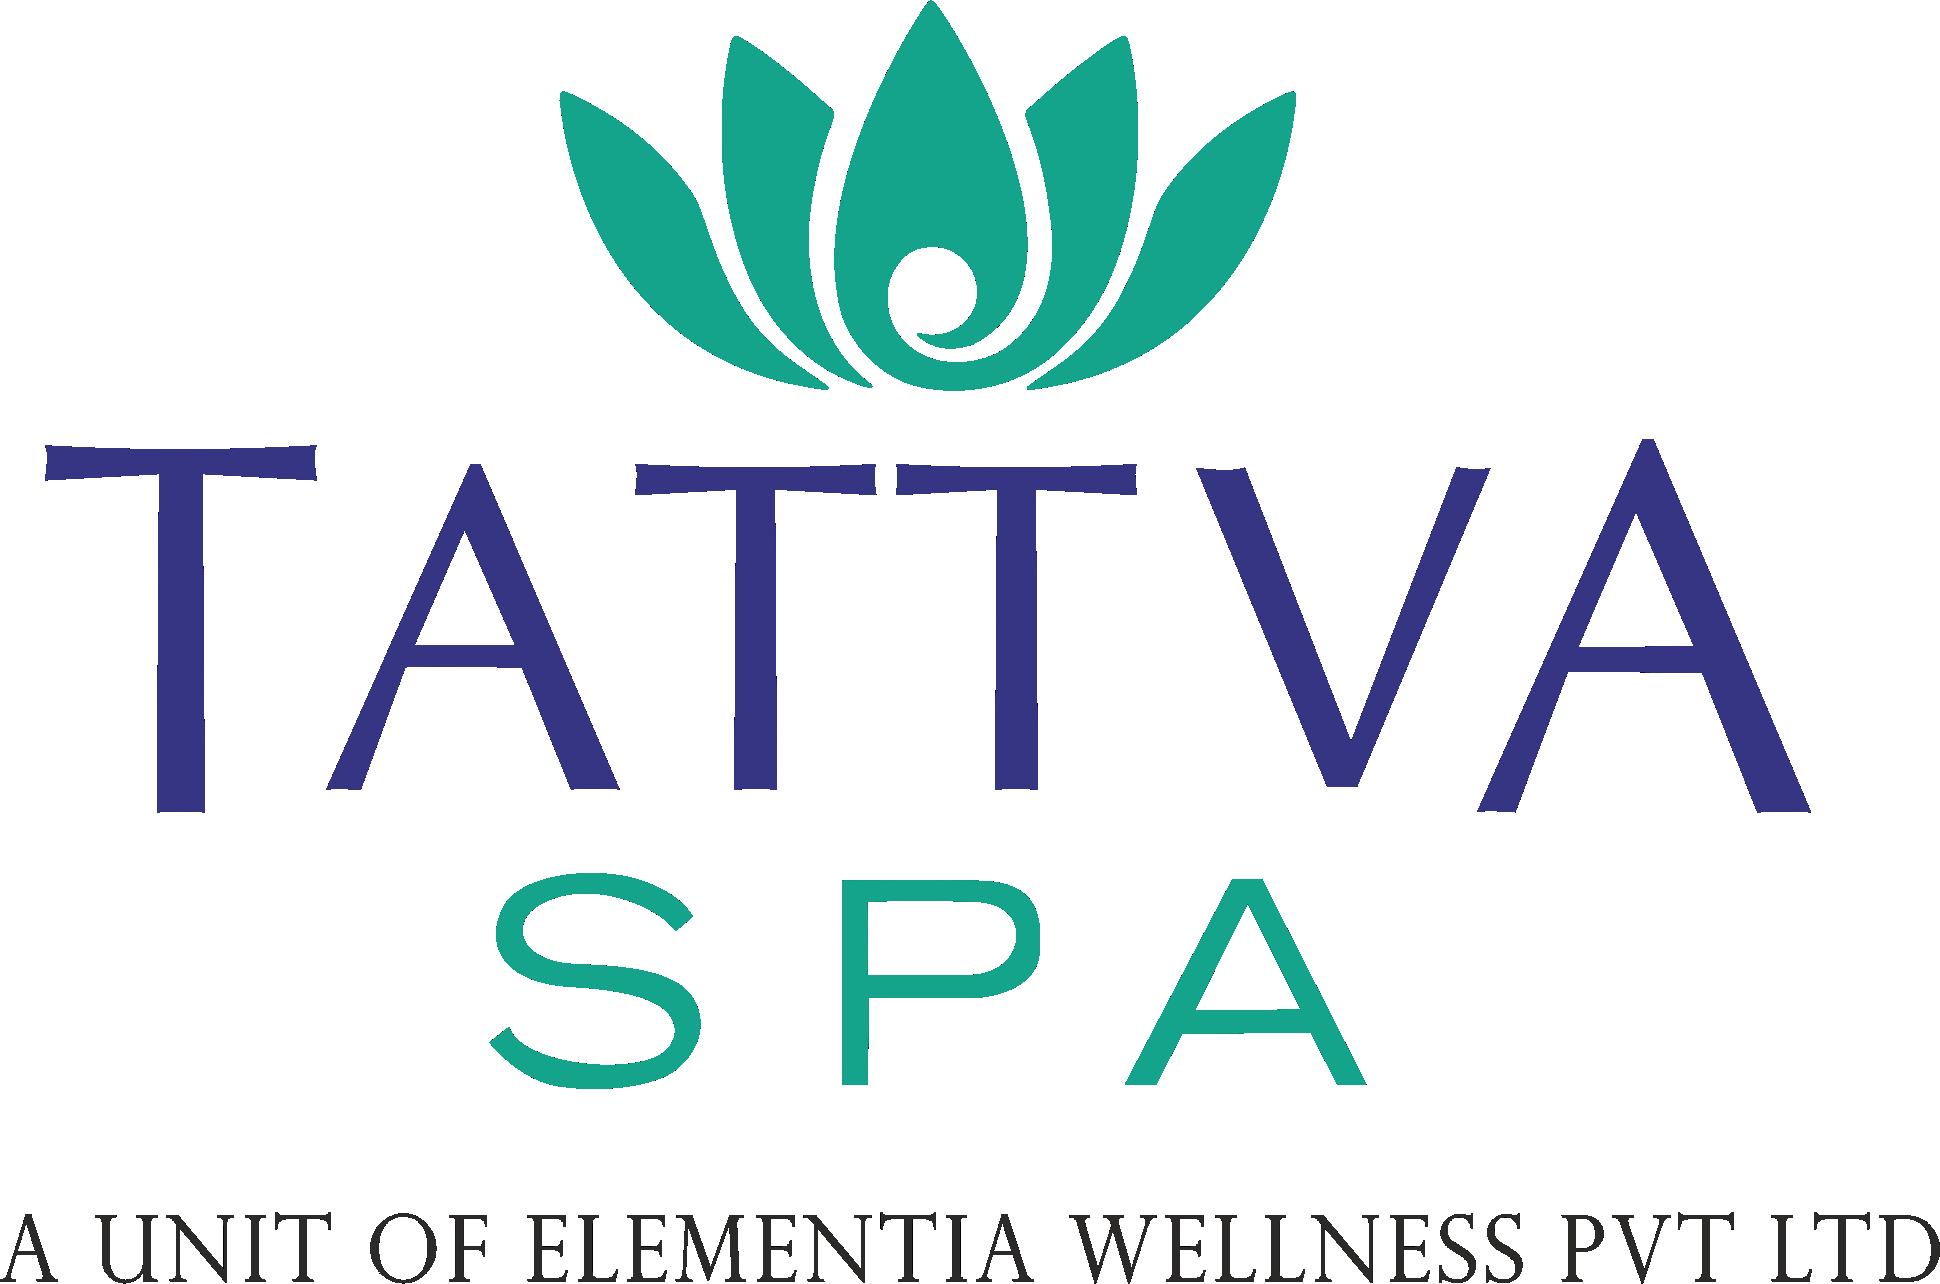 100 Best Thai Body Massage Centres In Chennai Tamil Nadu Nearmetrade Hours, address, tattva spa reviews: 100 best thai body massage centres in